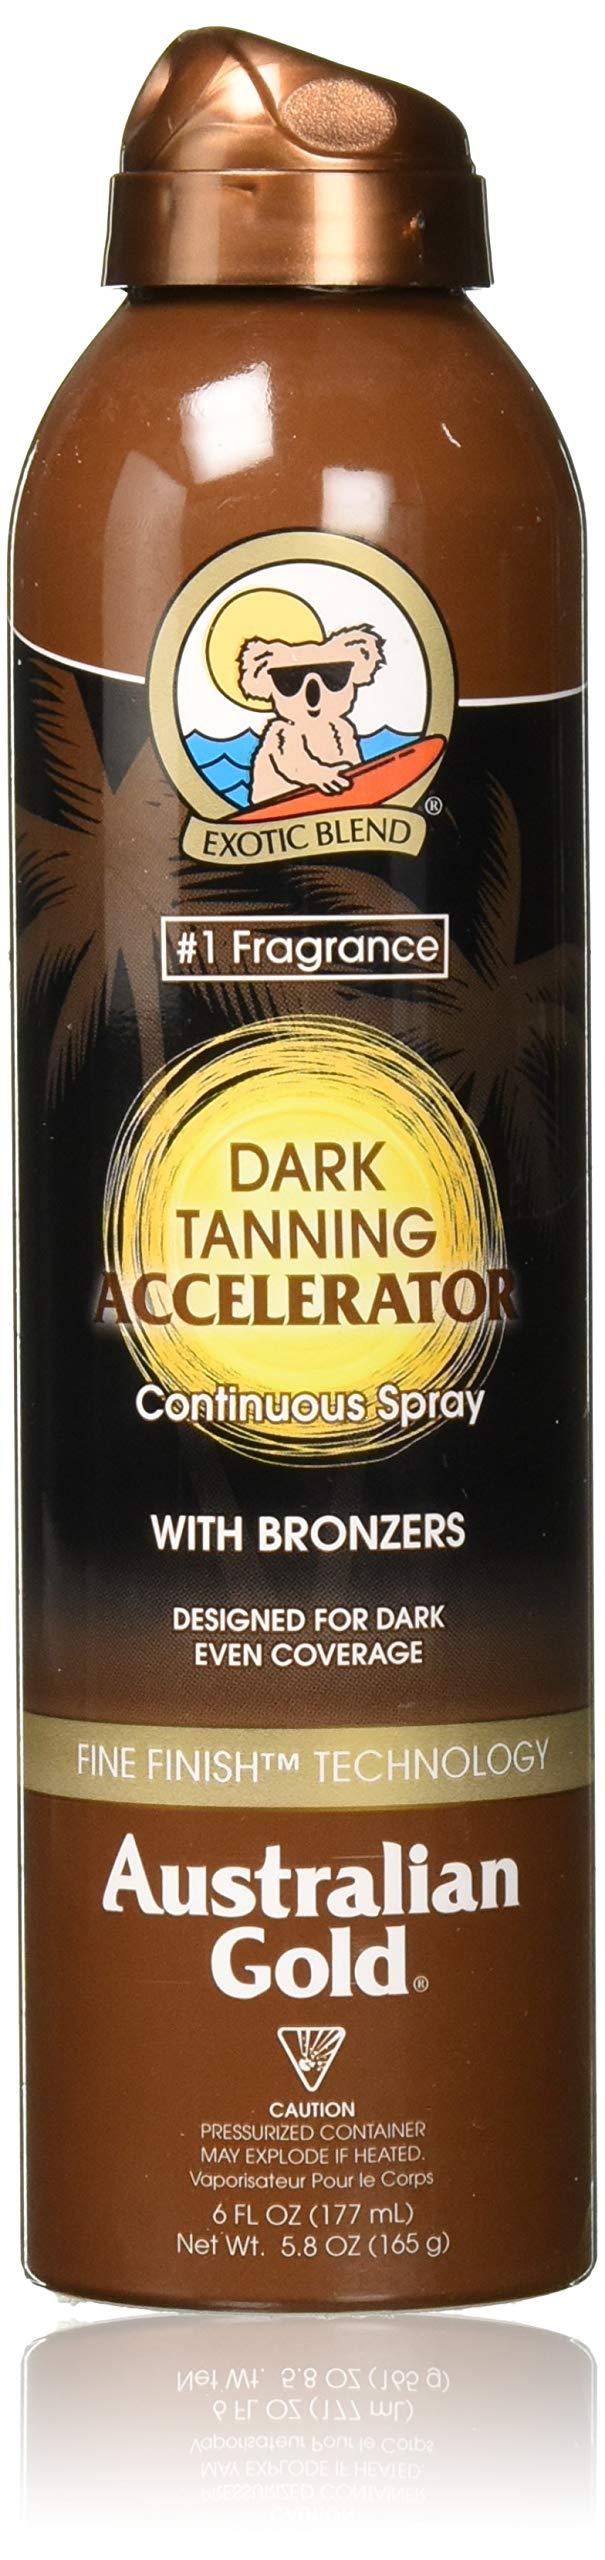 Australian Gold Dark Tanning Accelerator Continuous Spray Bronzer | 6 Ounce, multicolor (0054402260487)